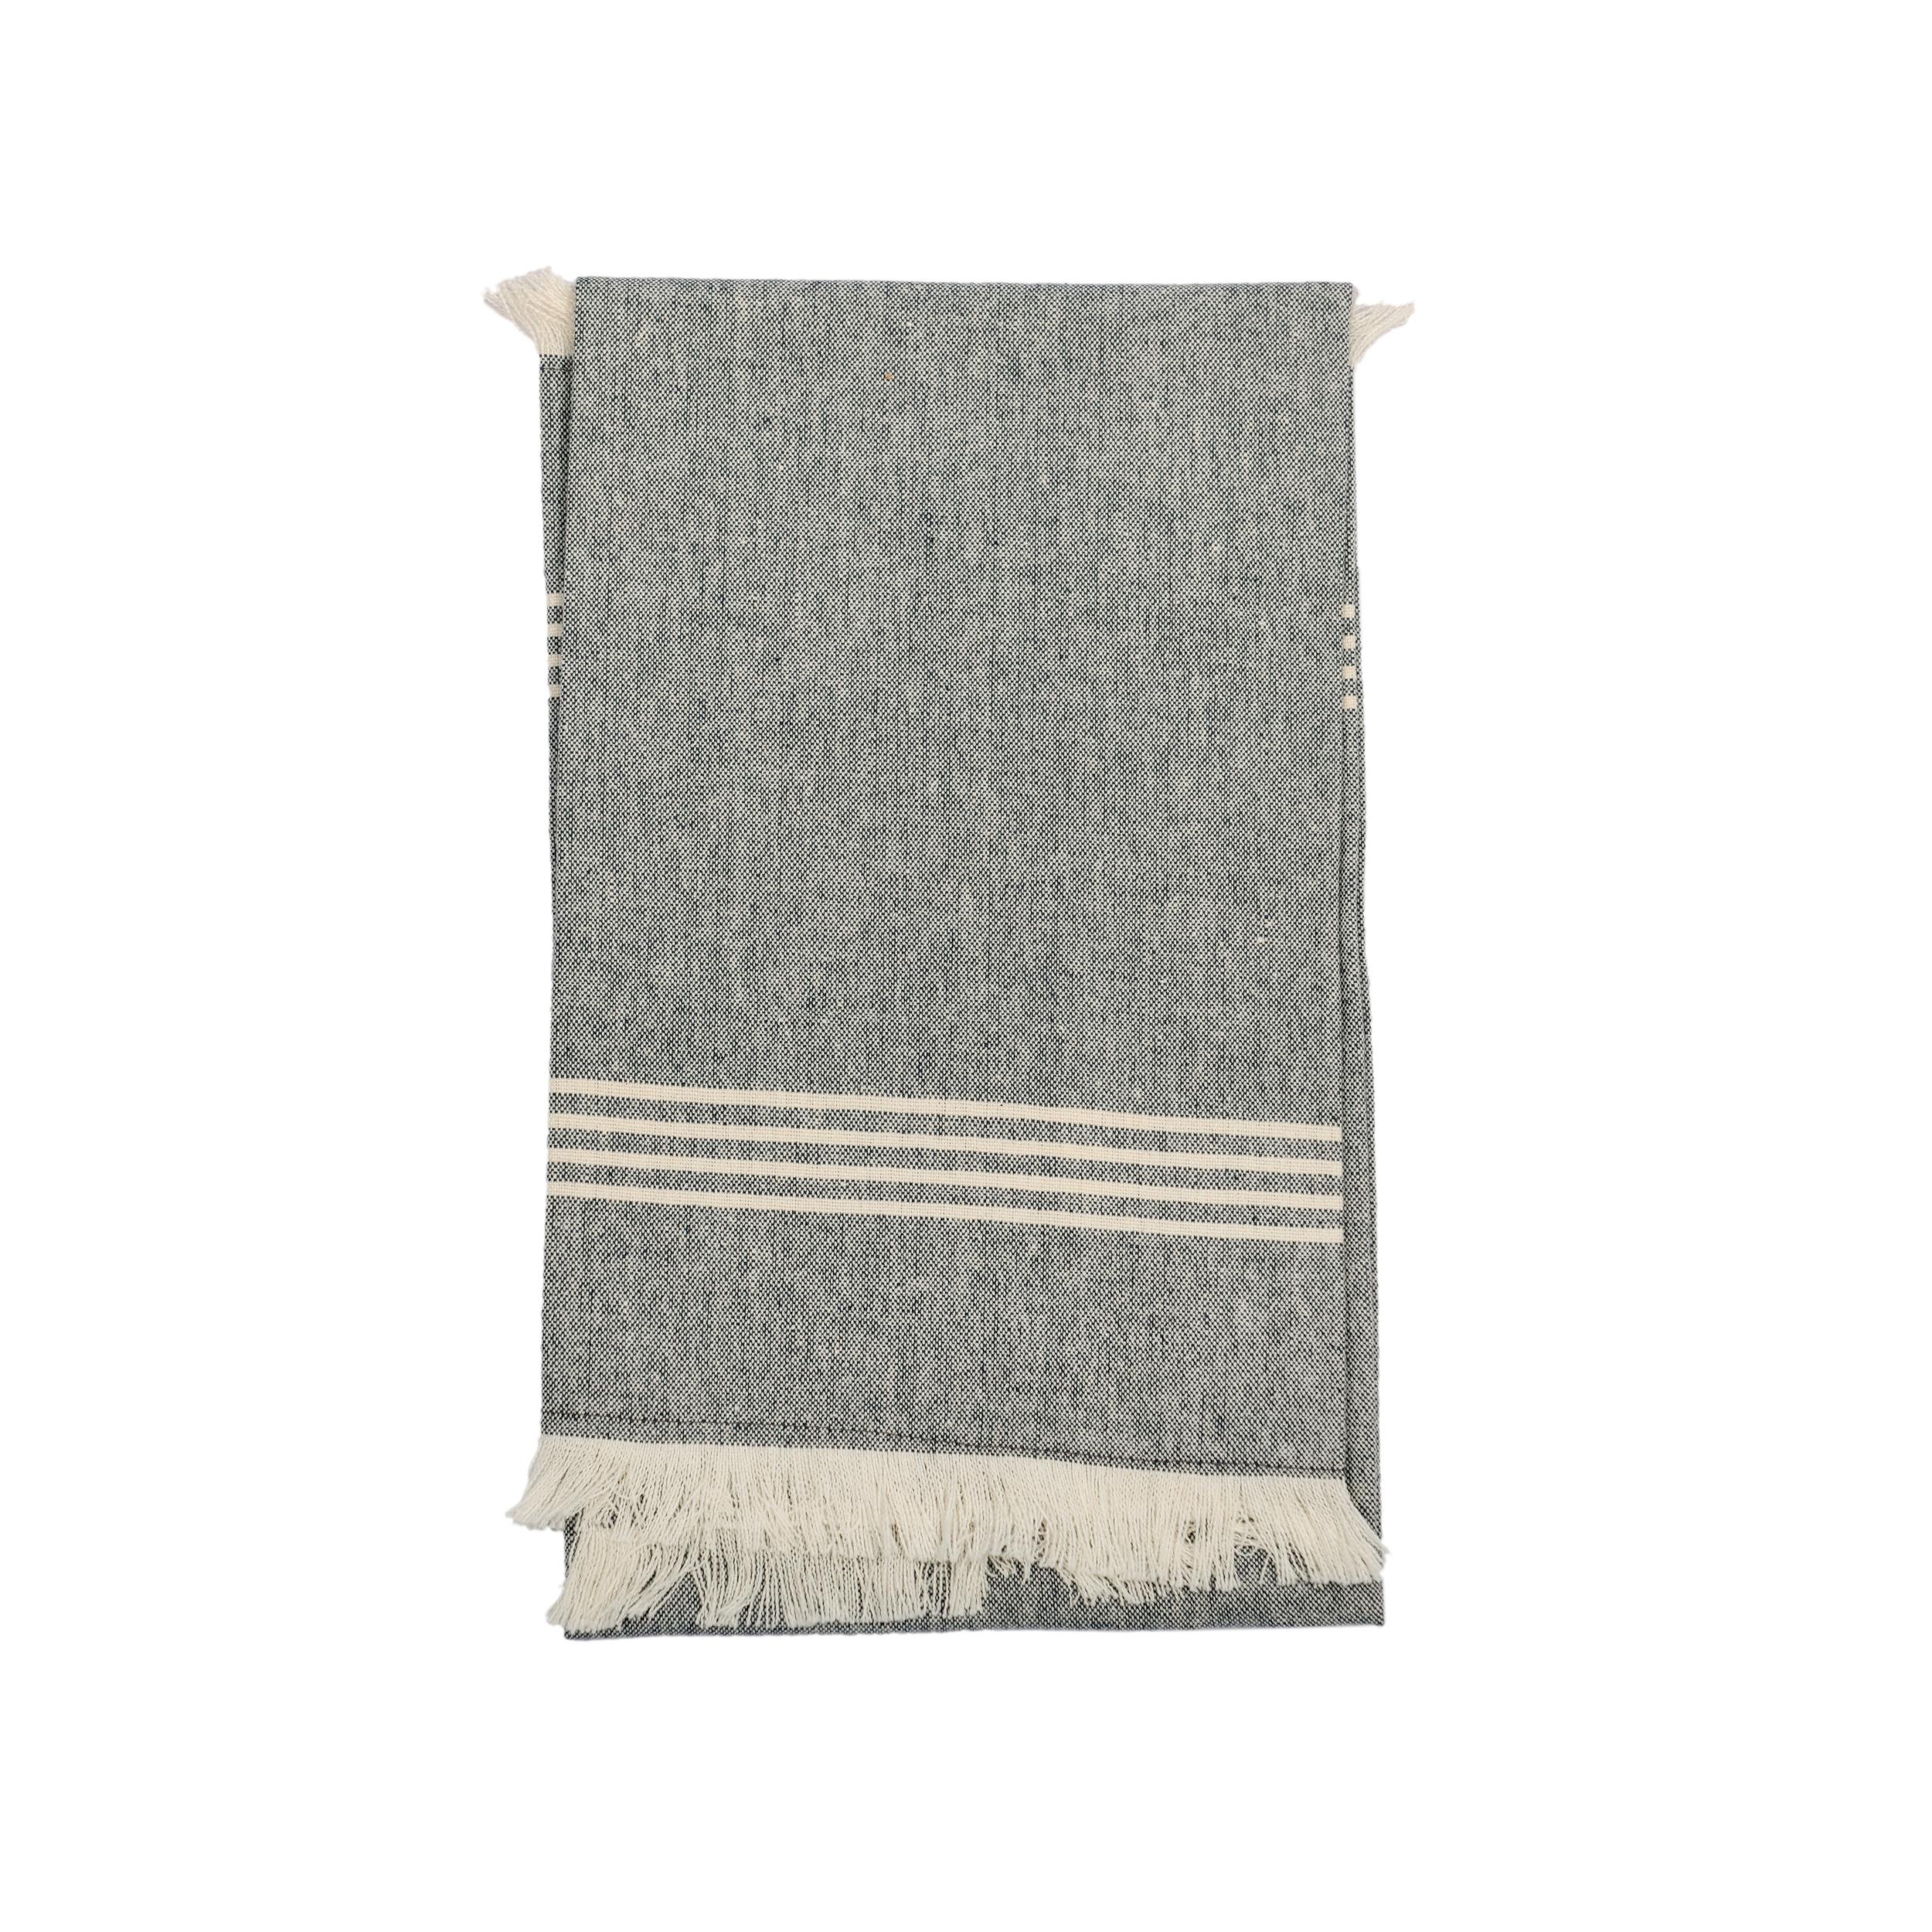 Kumas Large Navy & White Hand/ Tea Towel